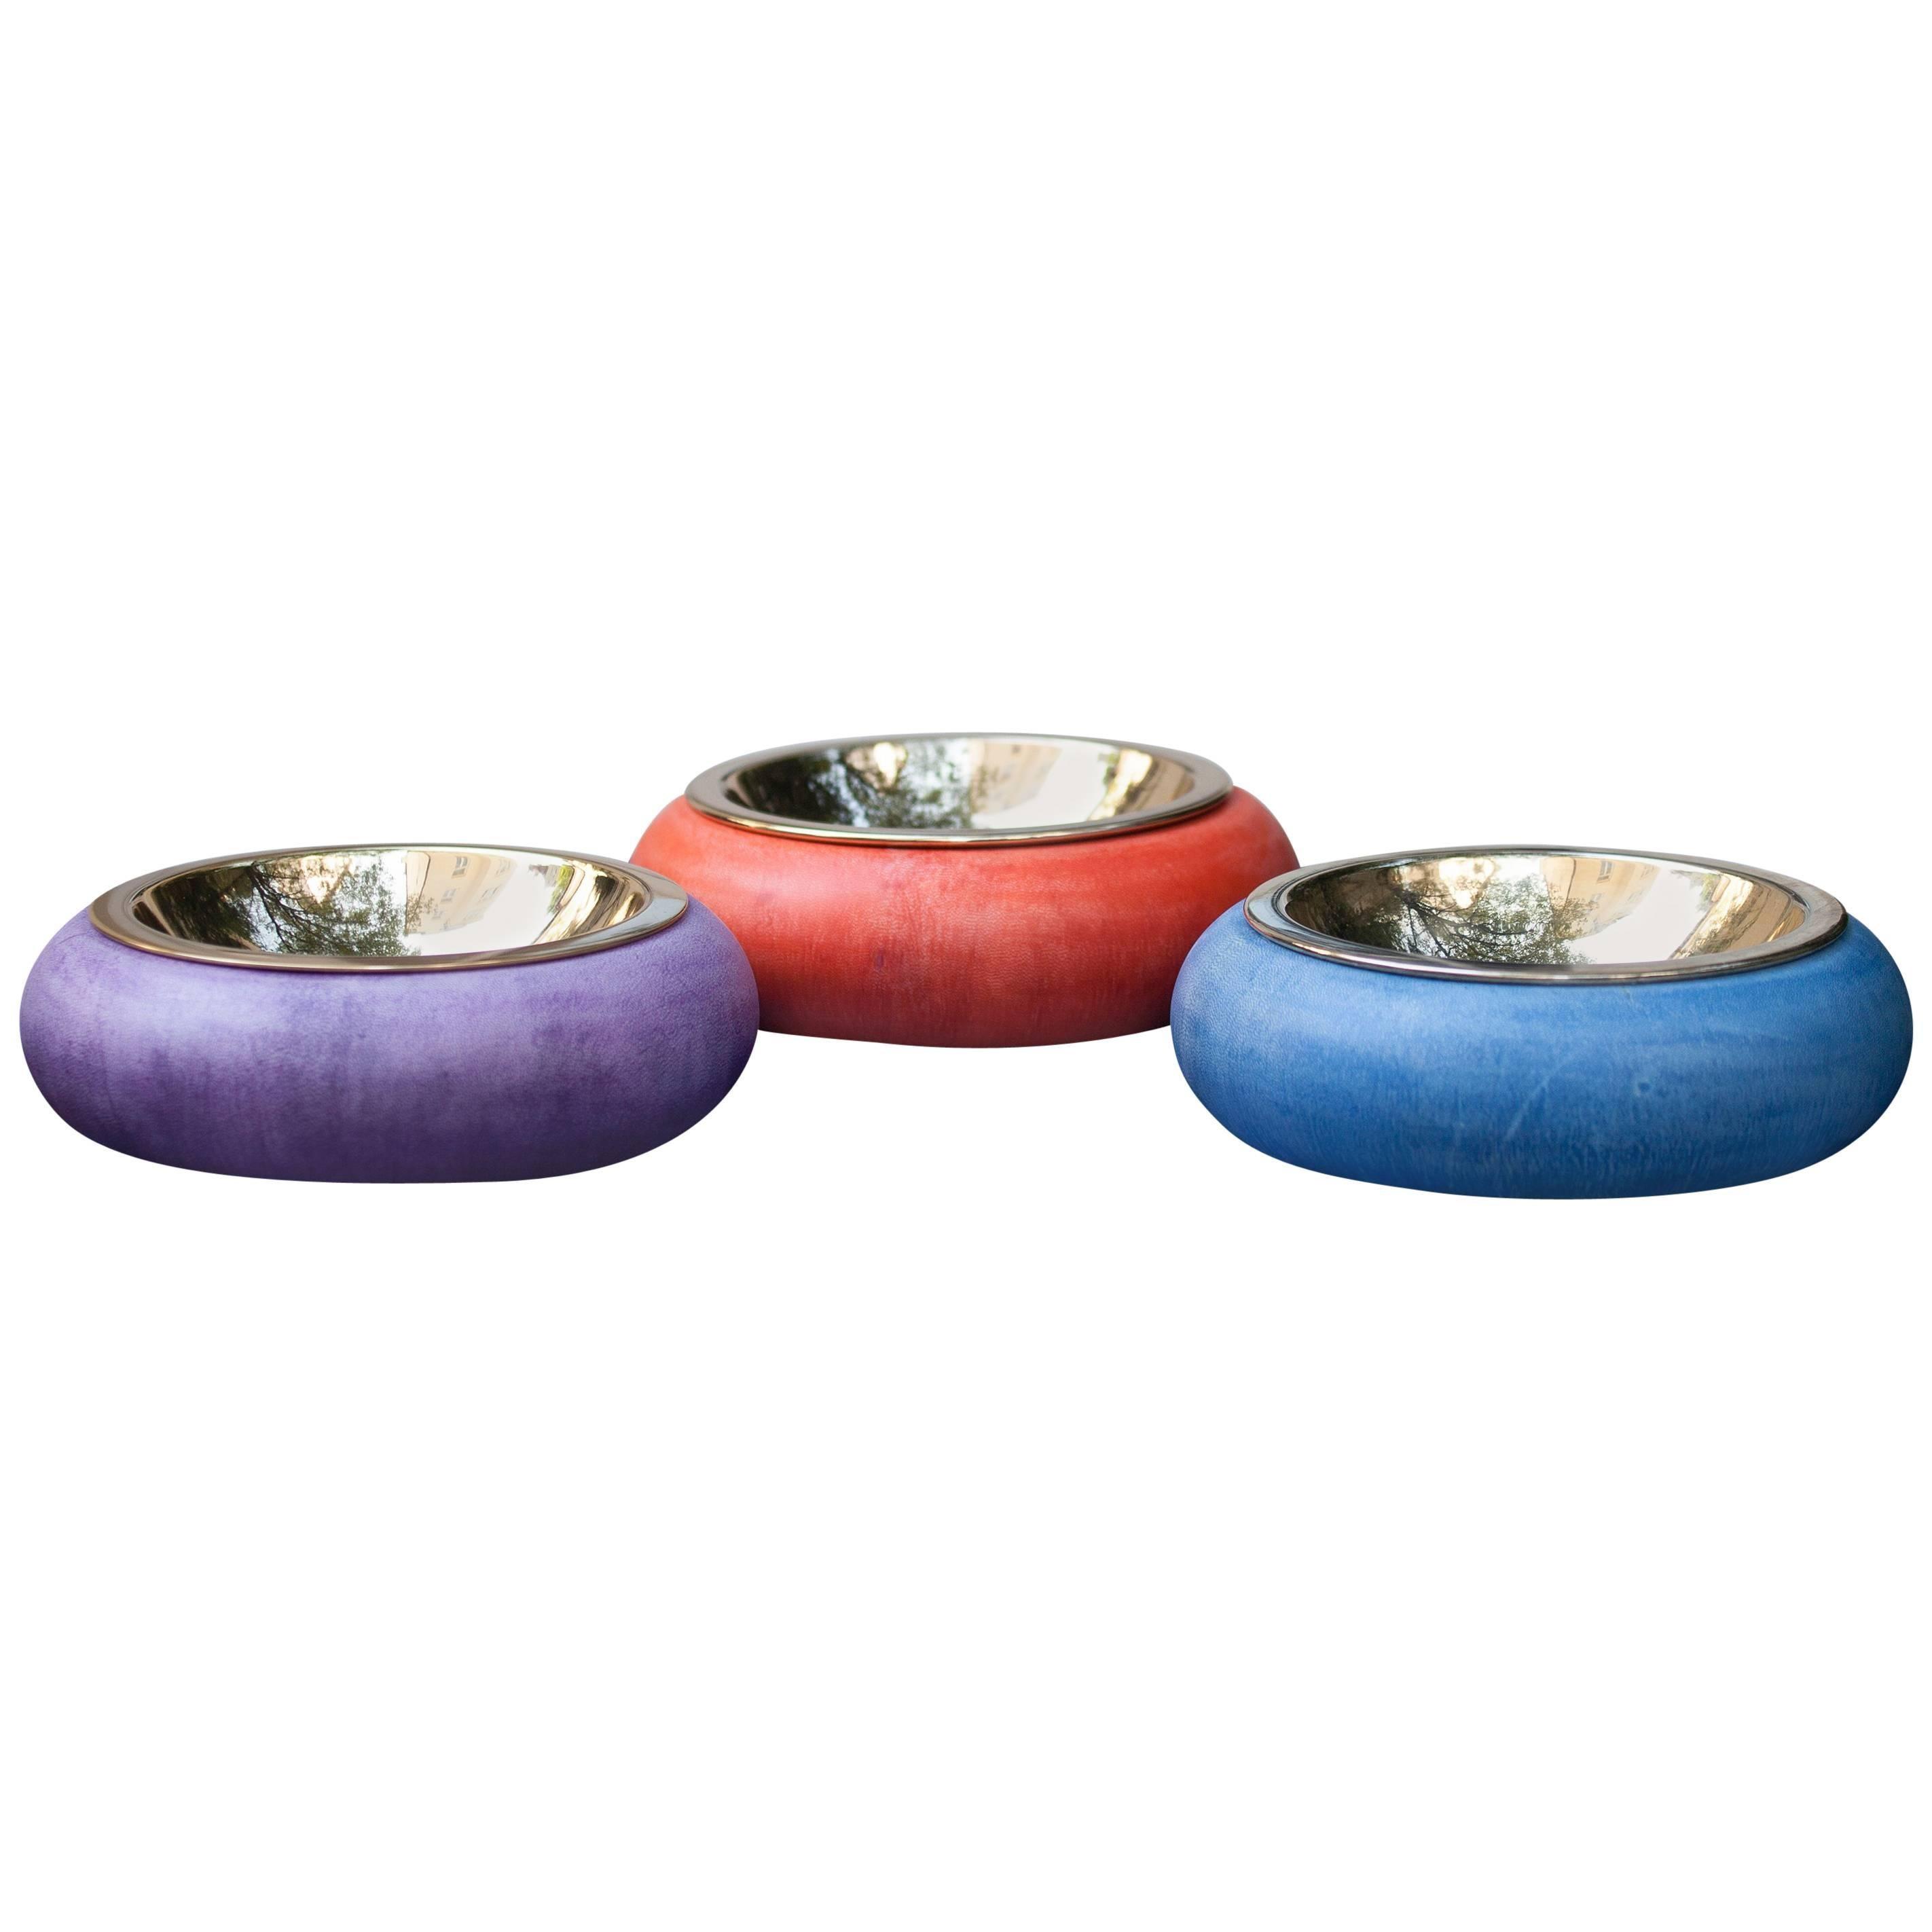 Aldo Tura Colorful Goatskin Bowls Set of Three